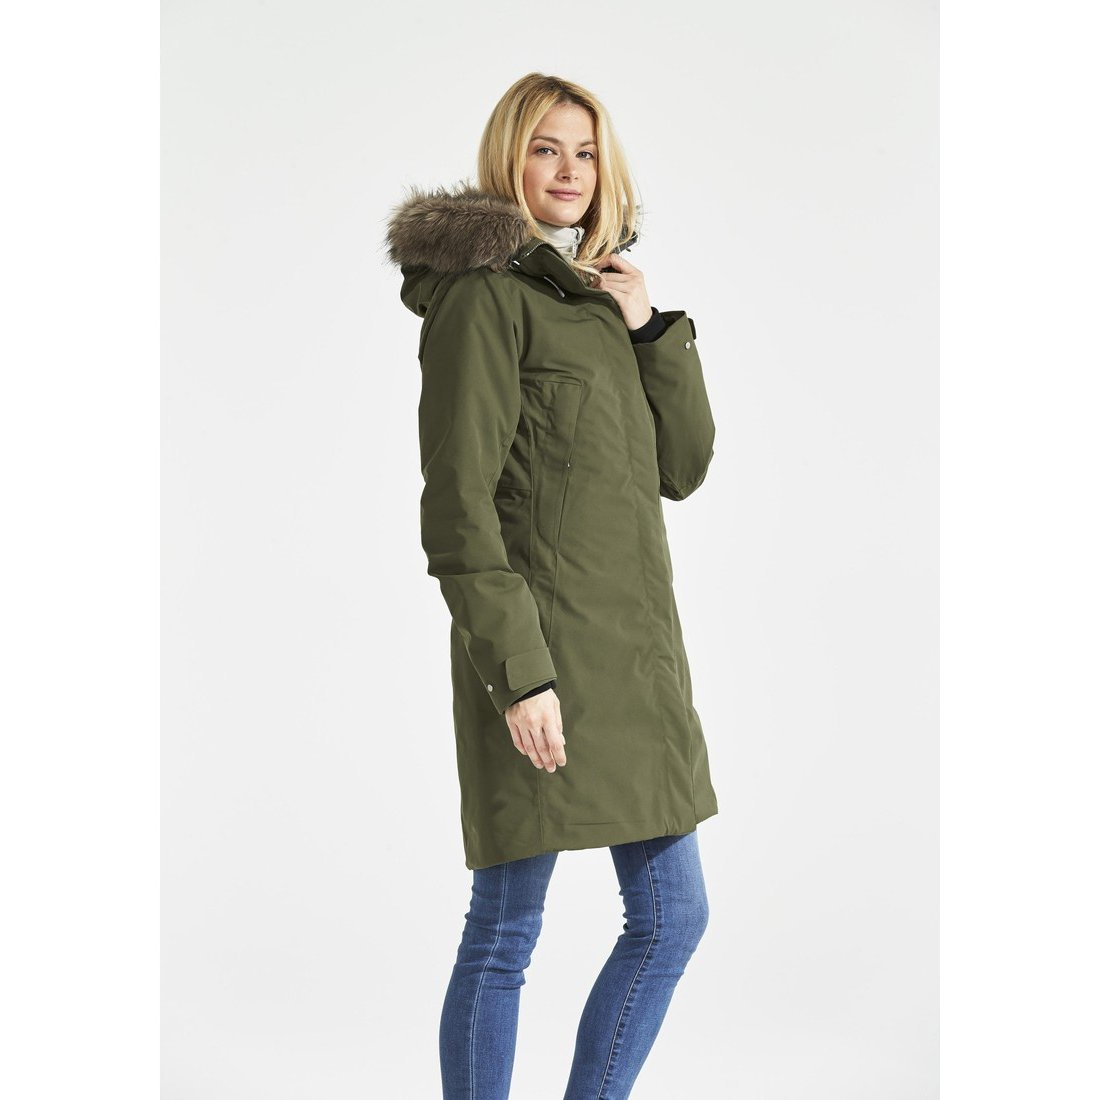 121edc8fdde Куртка женская Nadine (серо-зеленый) Didriksons 501817 161 для ...